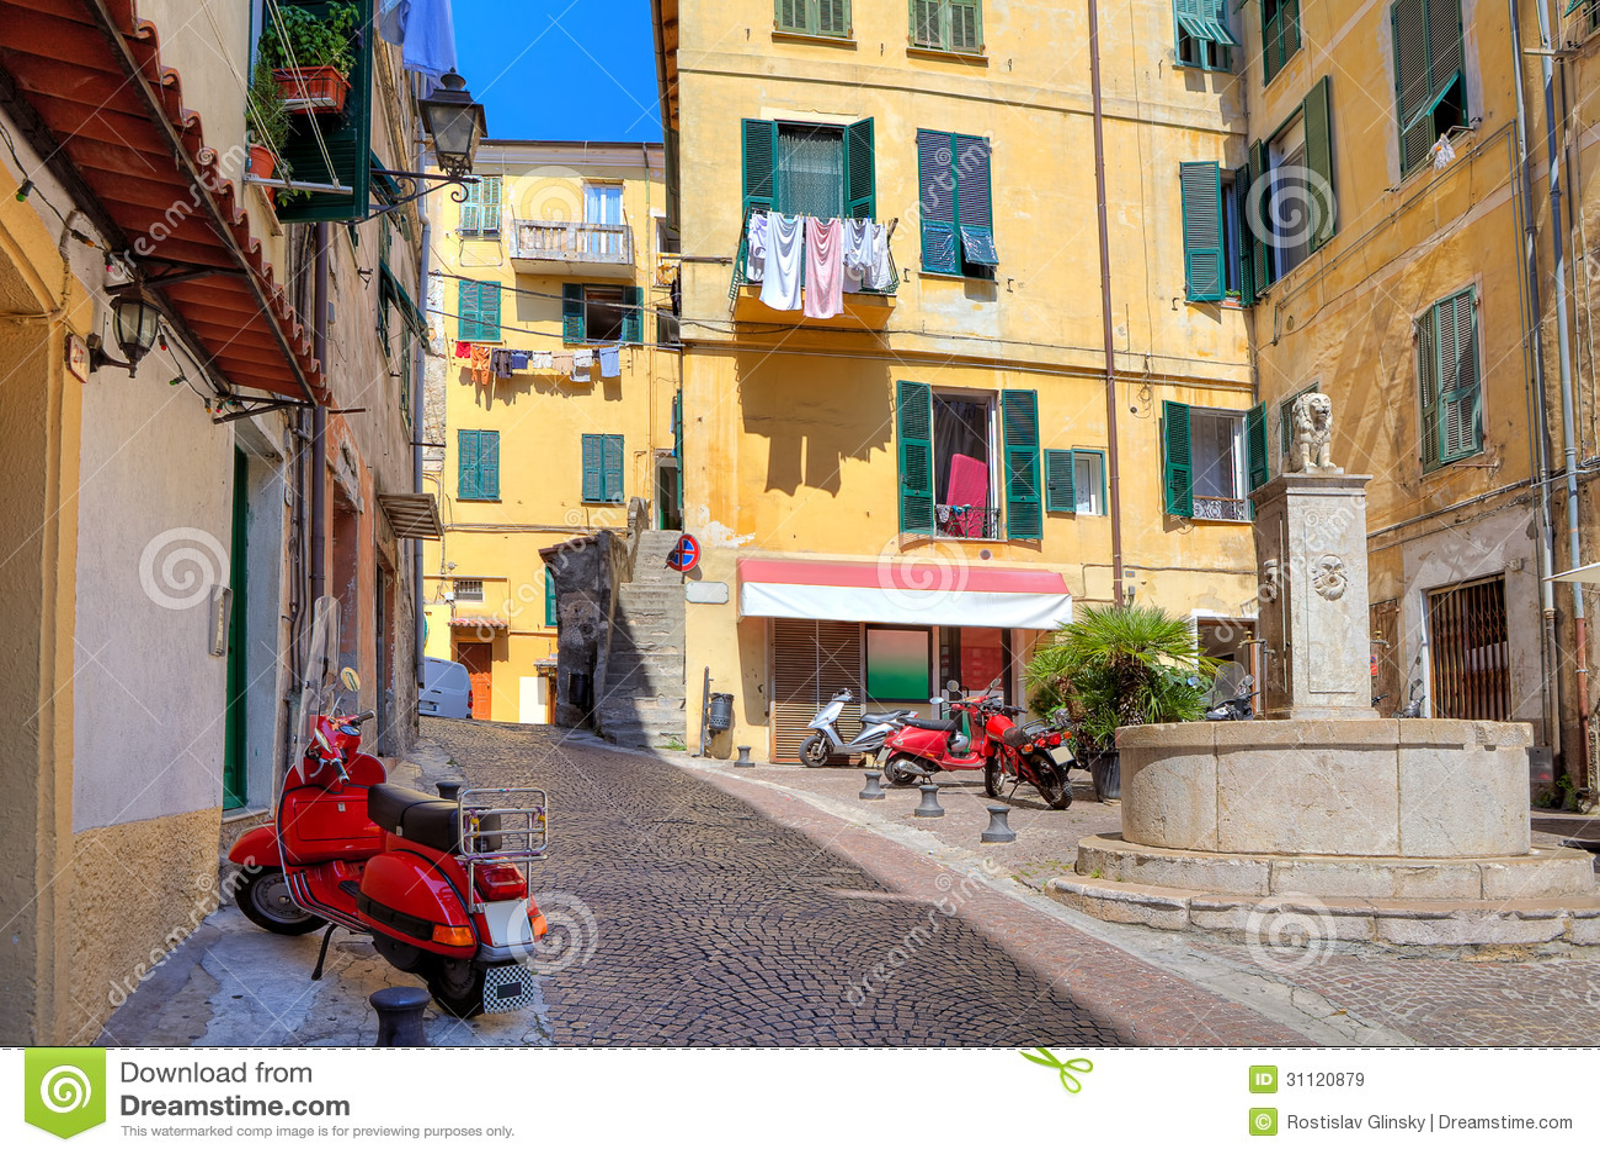 Moto Morini mopeds versus Italian mopeds with a Motori